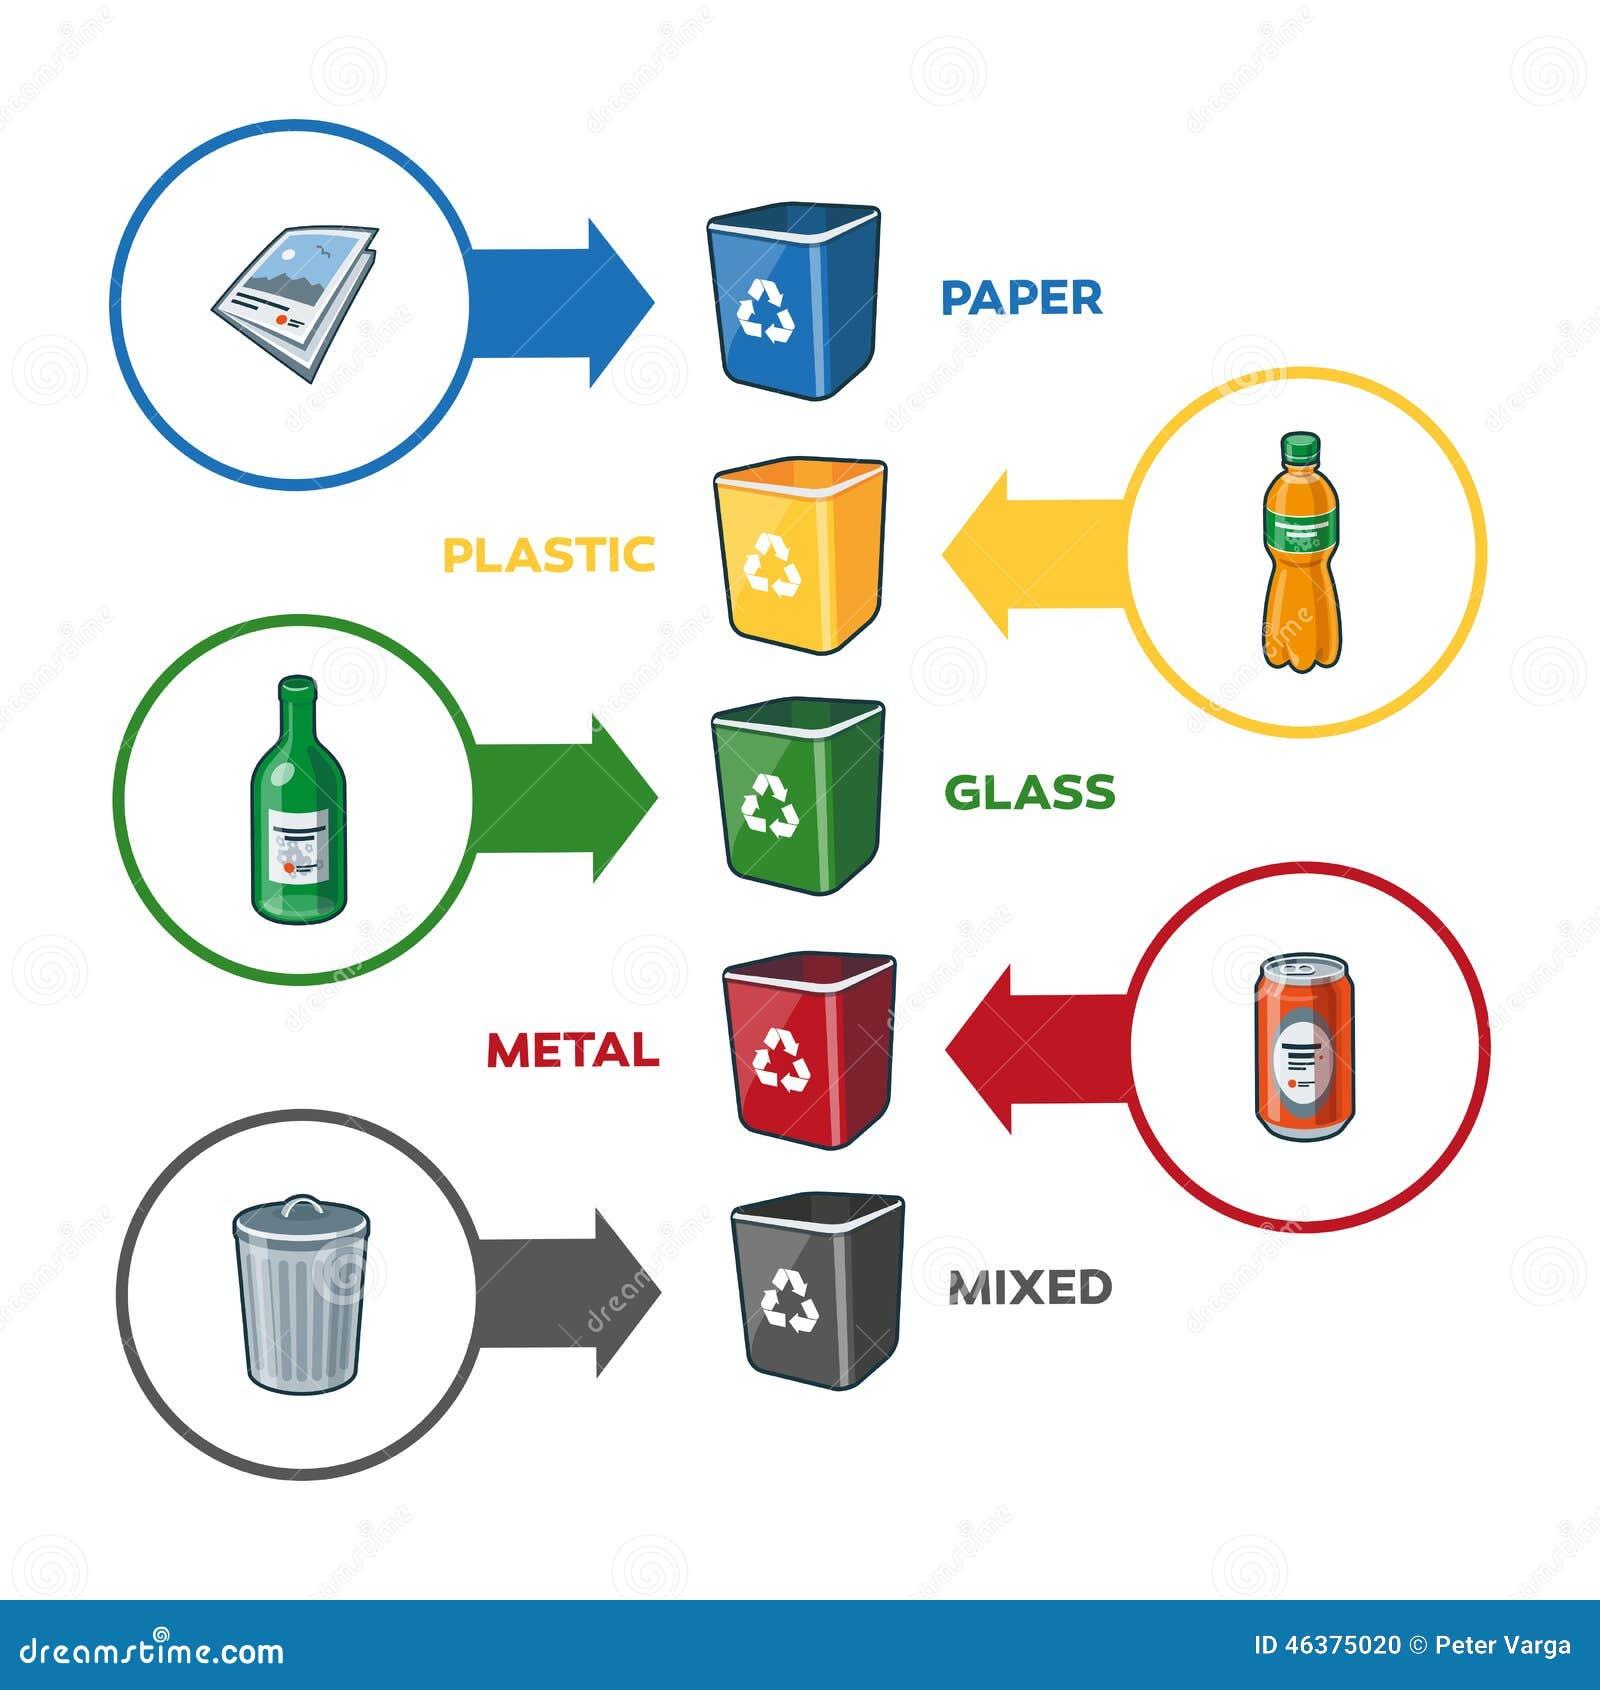 Recycling Bin Glass Paper Plastic Metal